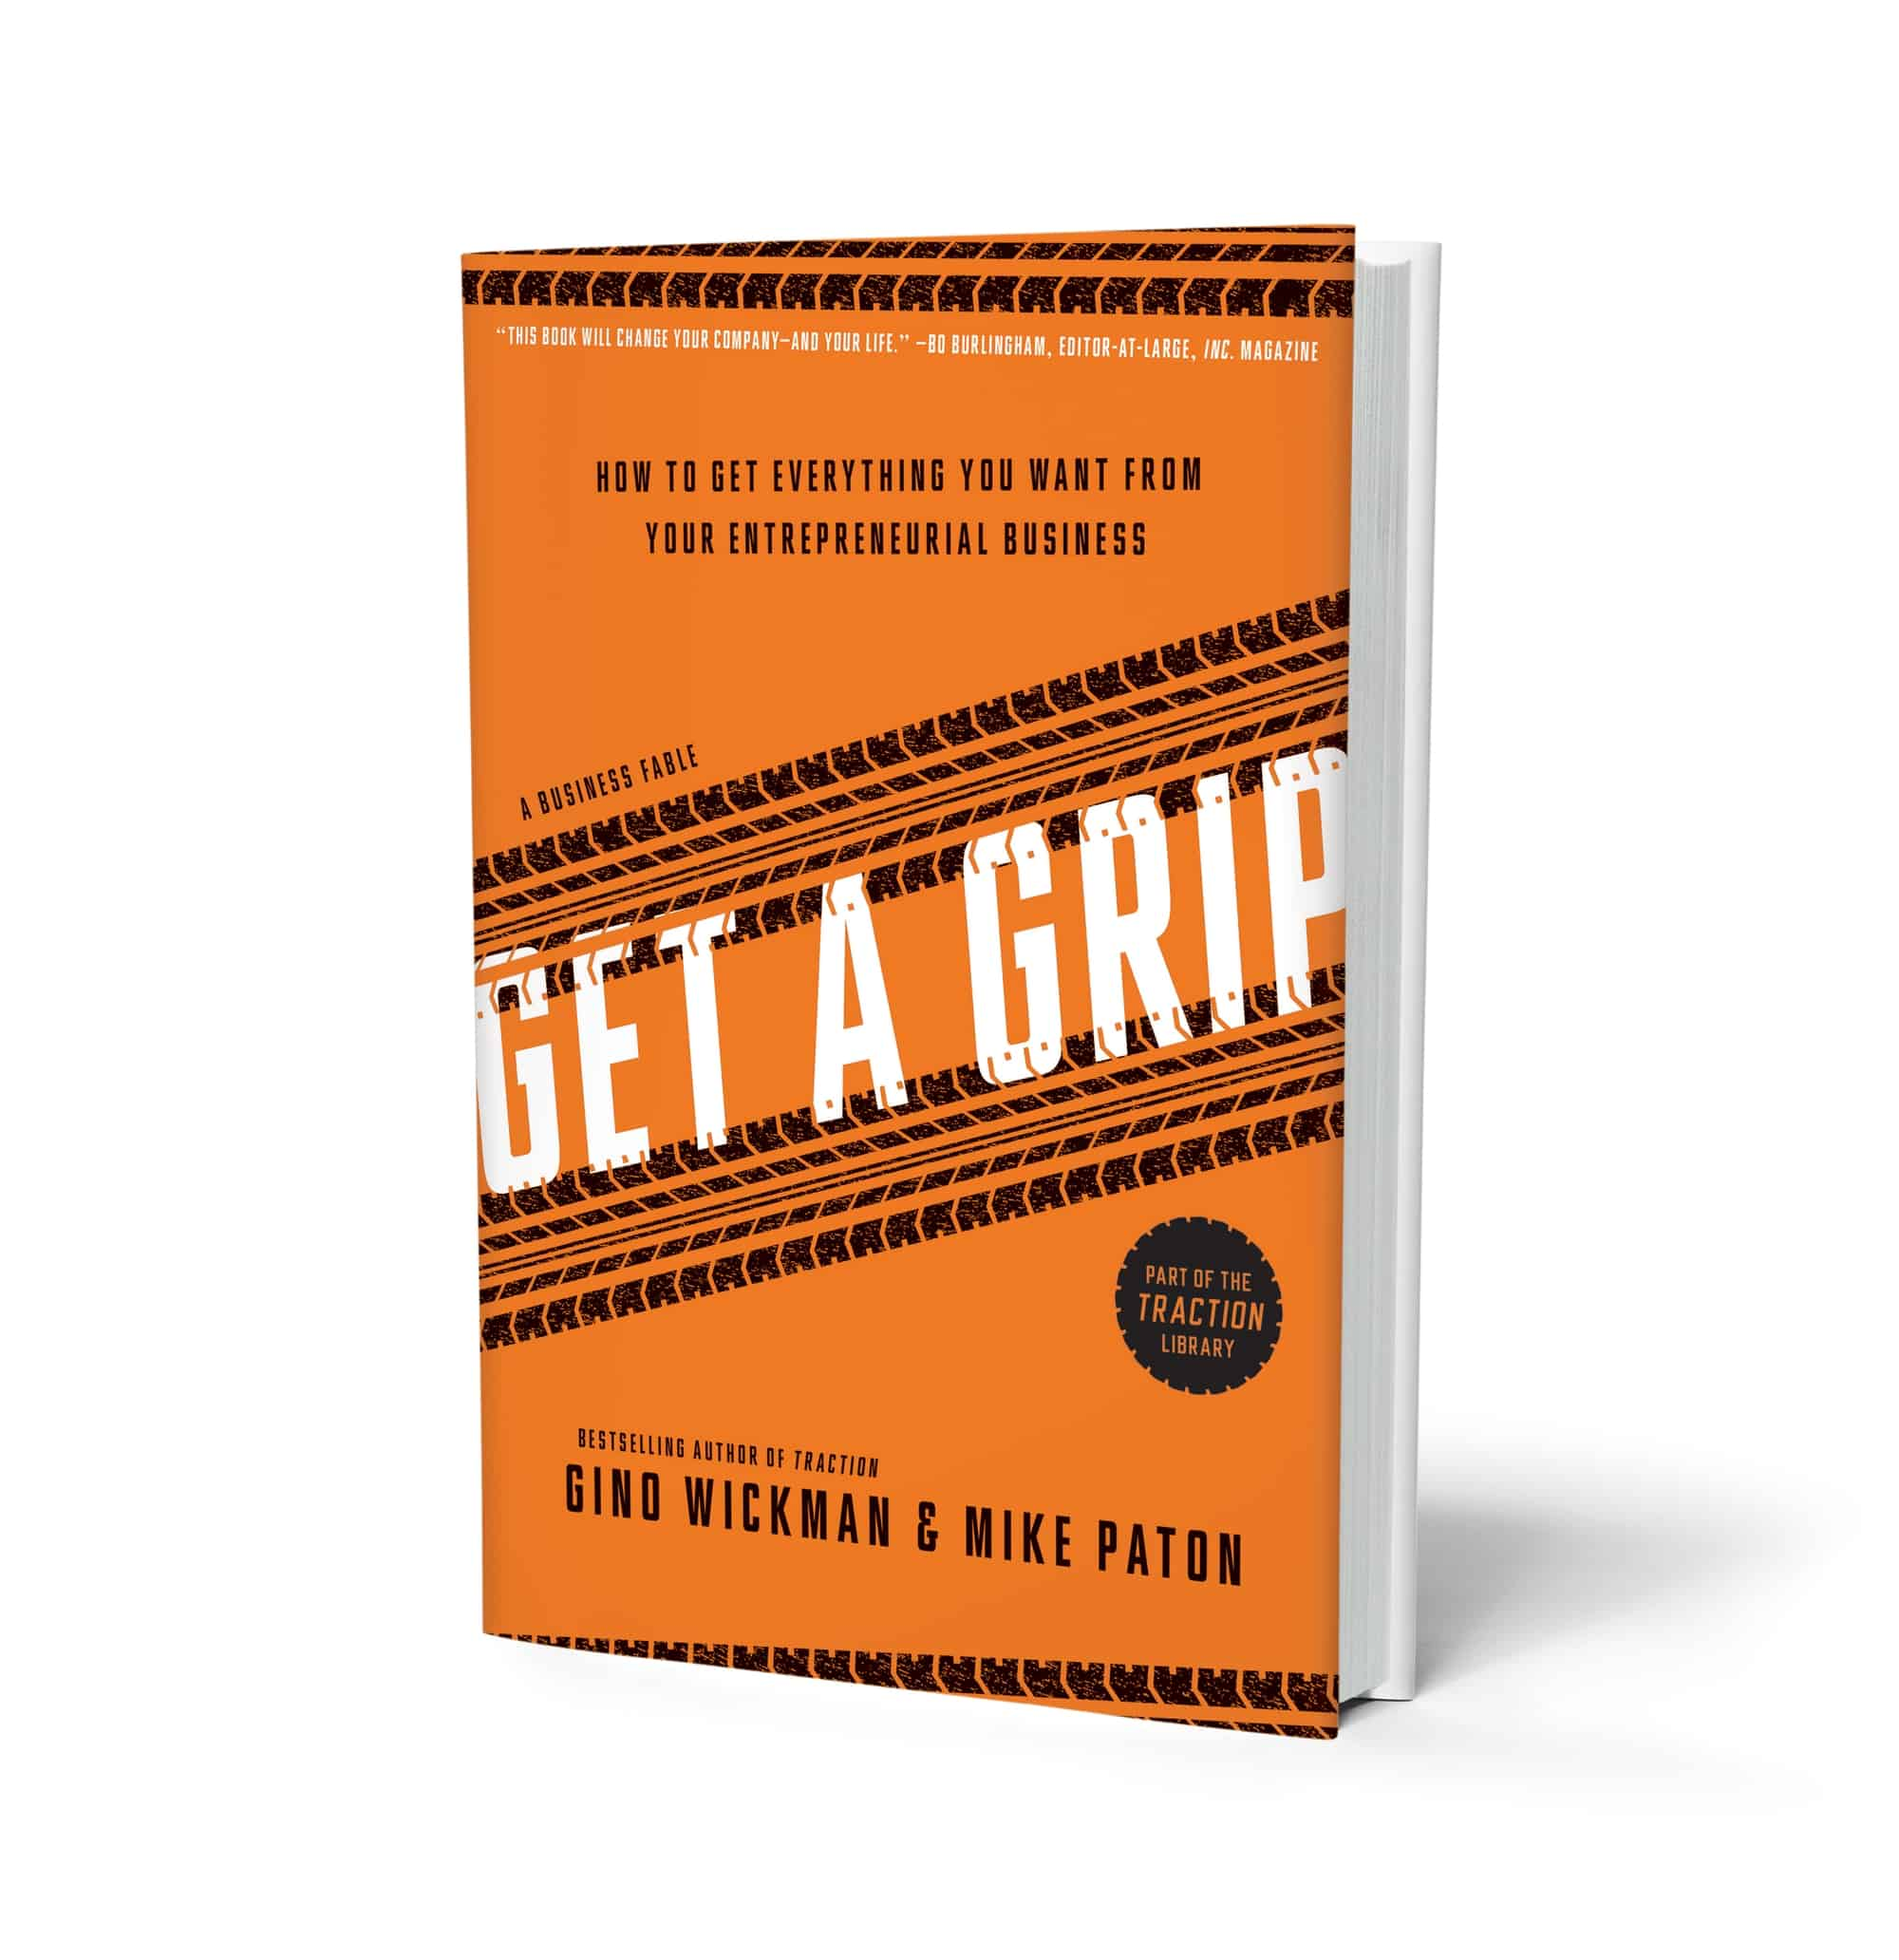 5c76fee83df0912c1c730104_get-a-grip-book-cover-p-2000